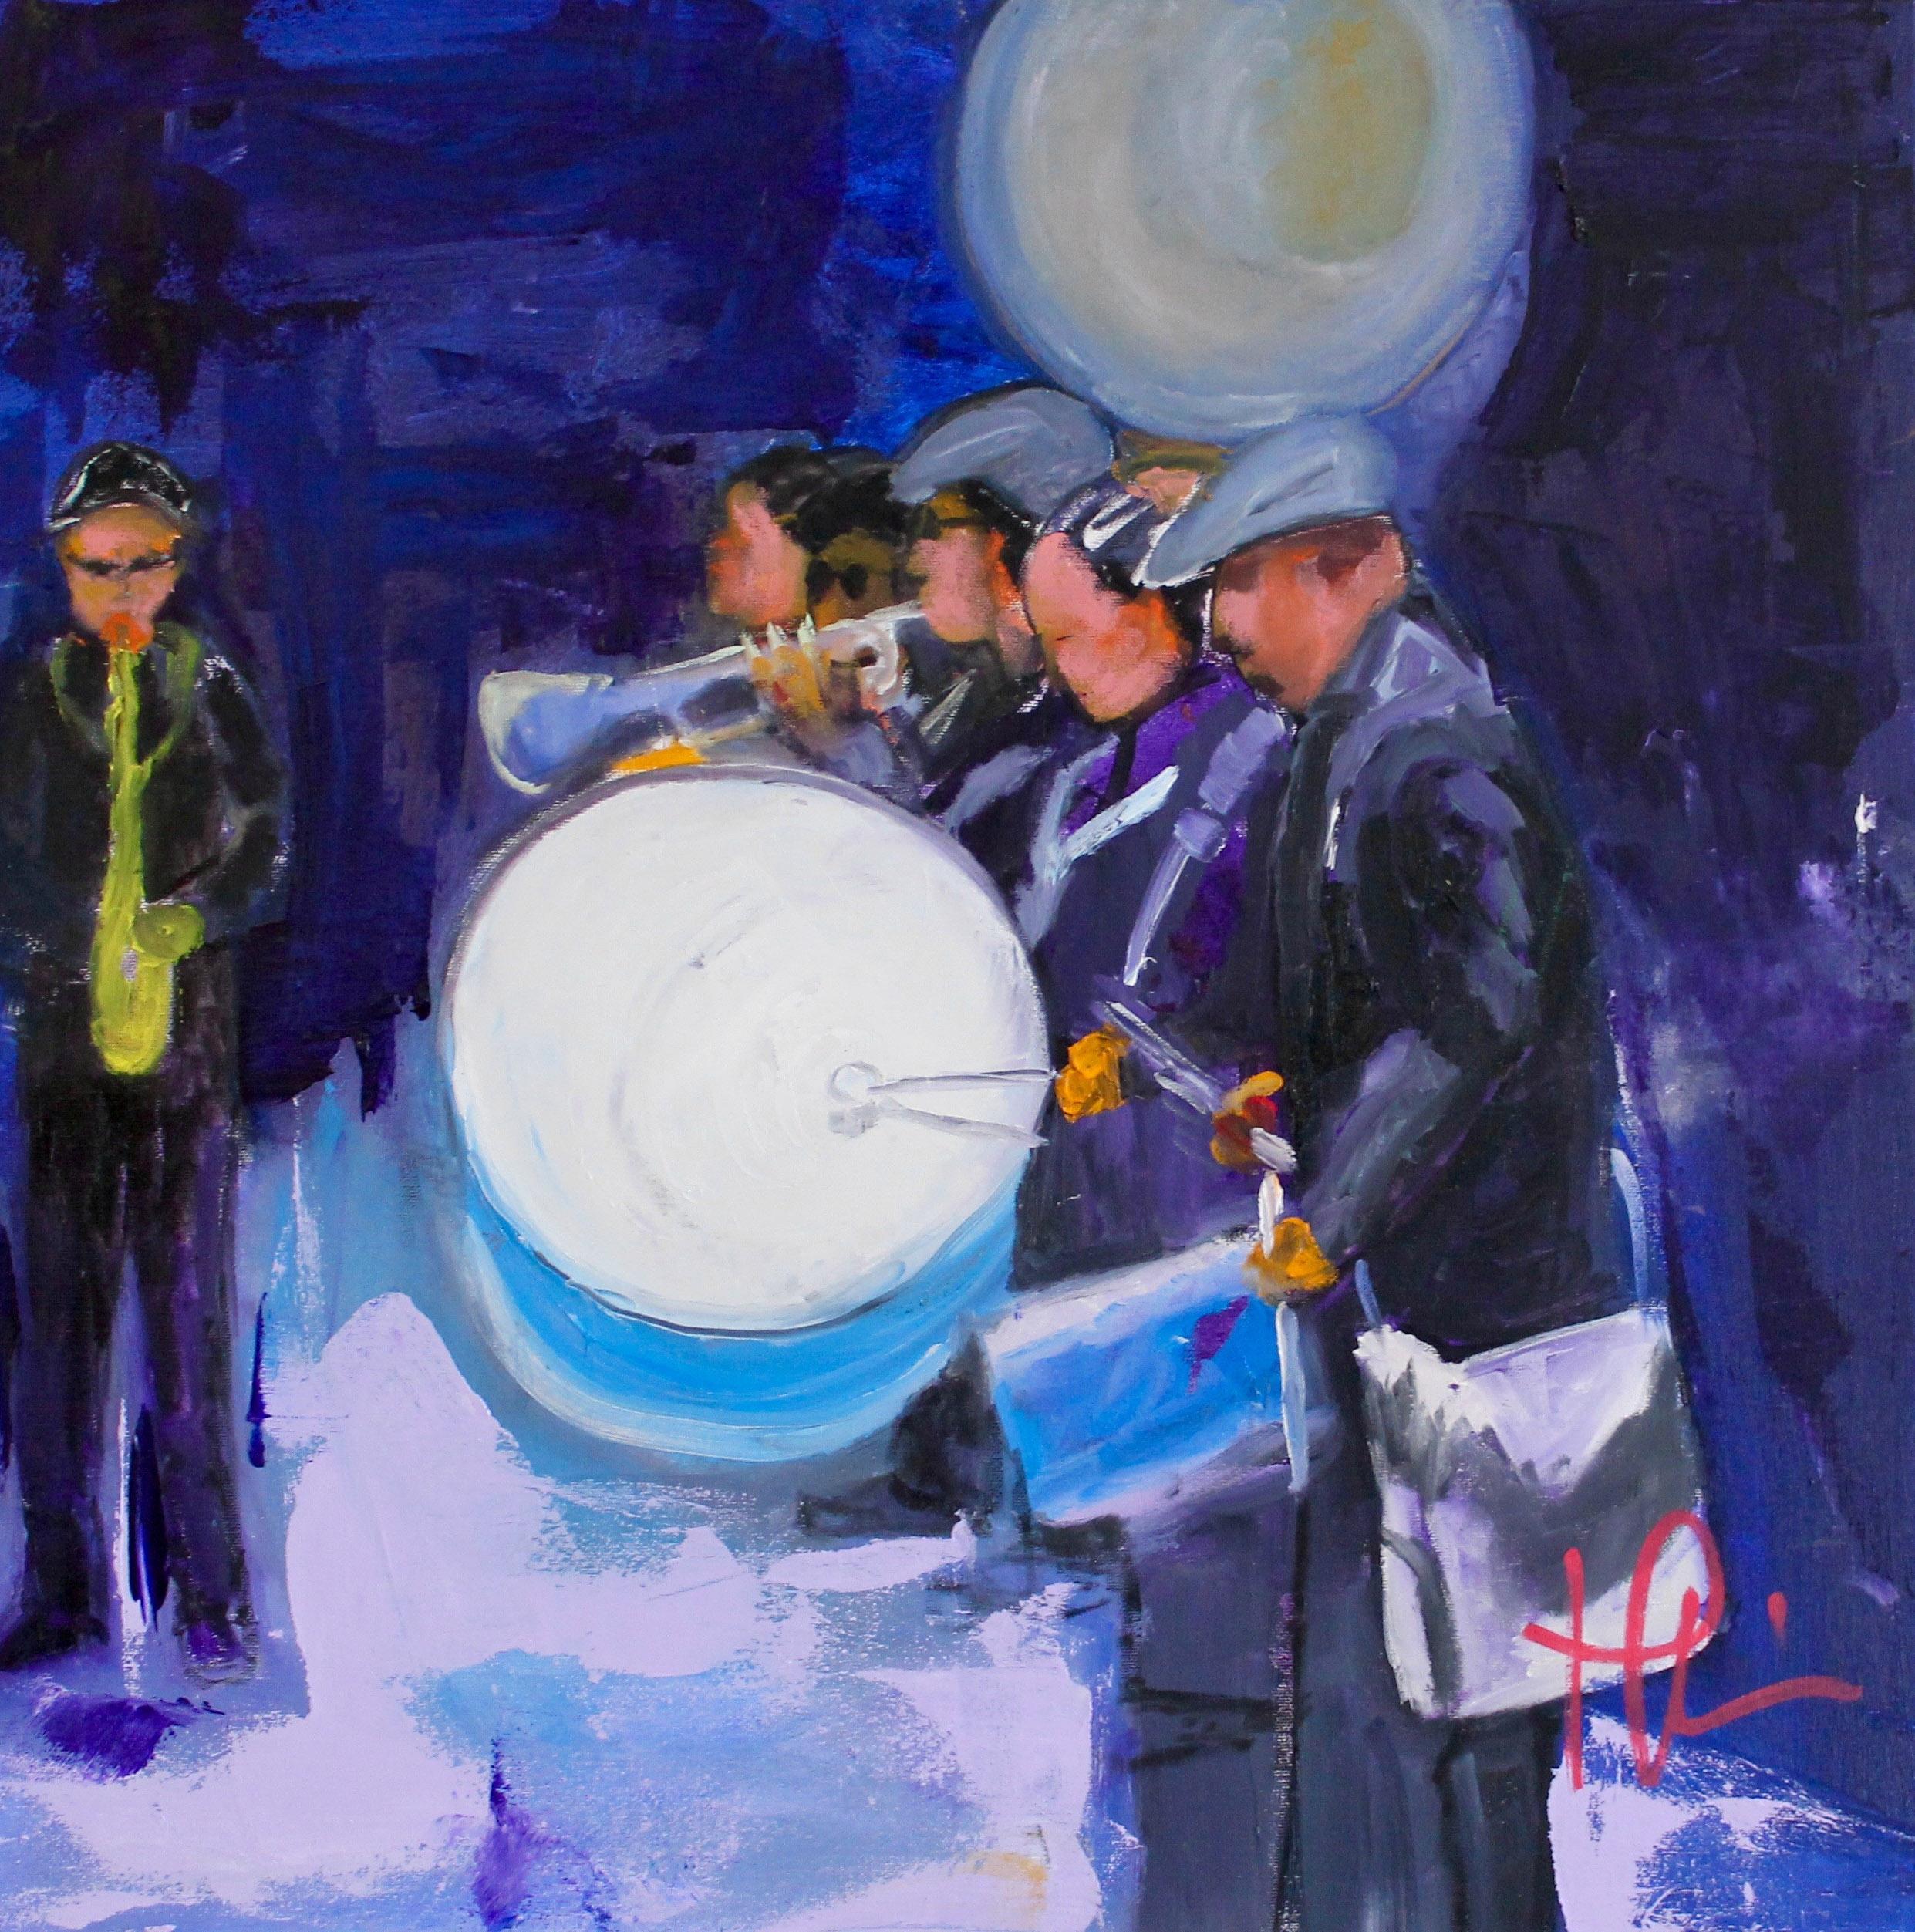 Brkyln Band-Oil on Canvas-24x24_Mijos-Studio.jpg